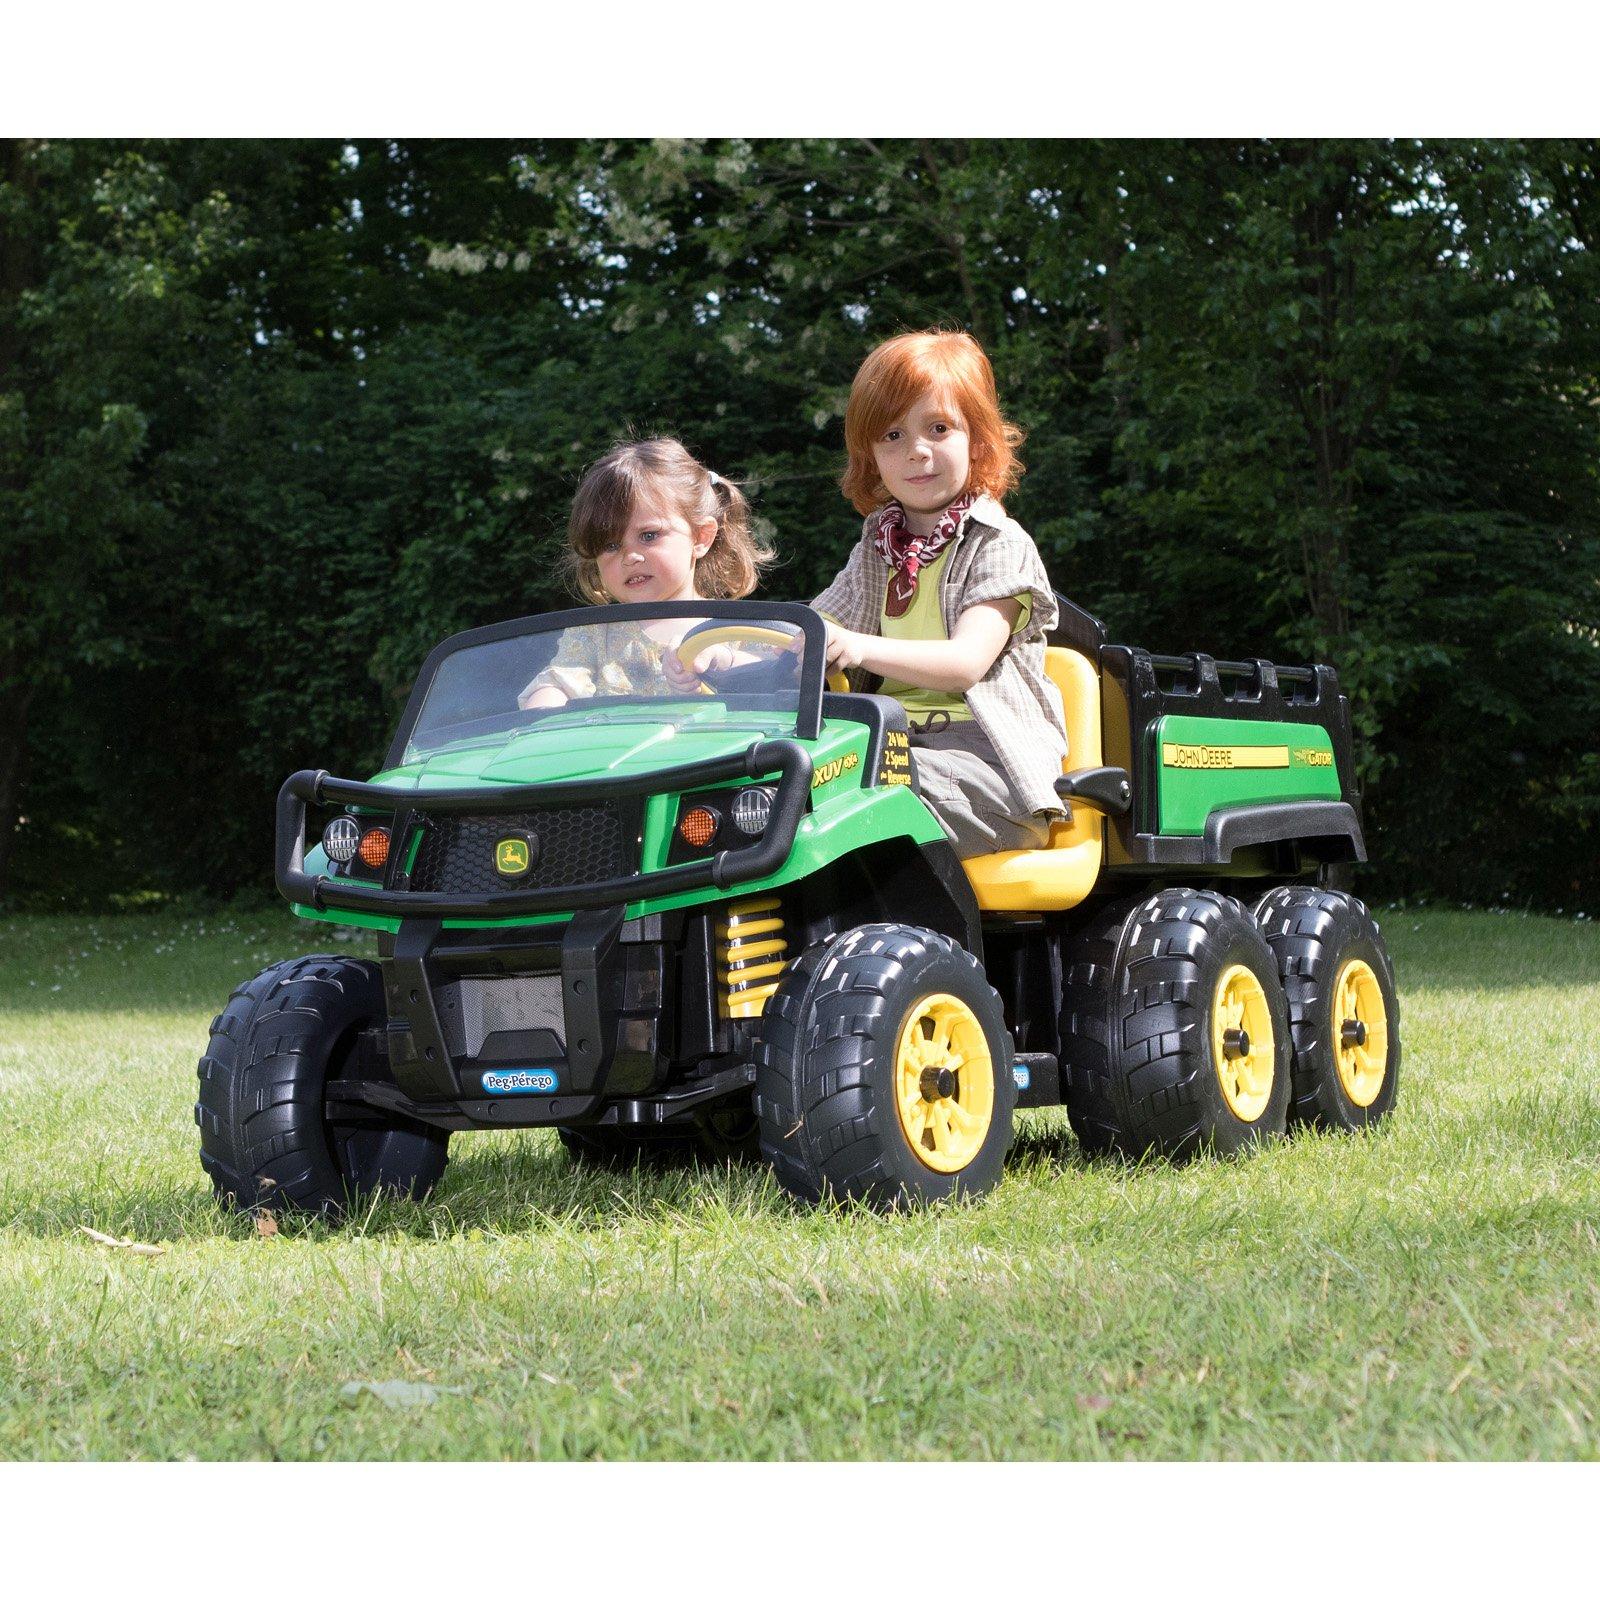 John Deere Gator XUV 6x4 Battery Powered Riding Toy